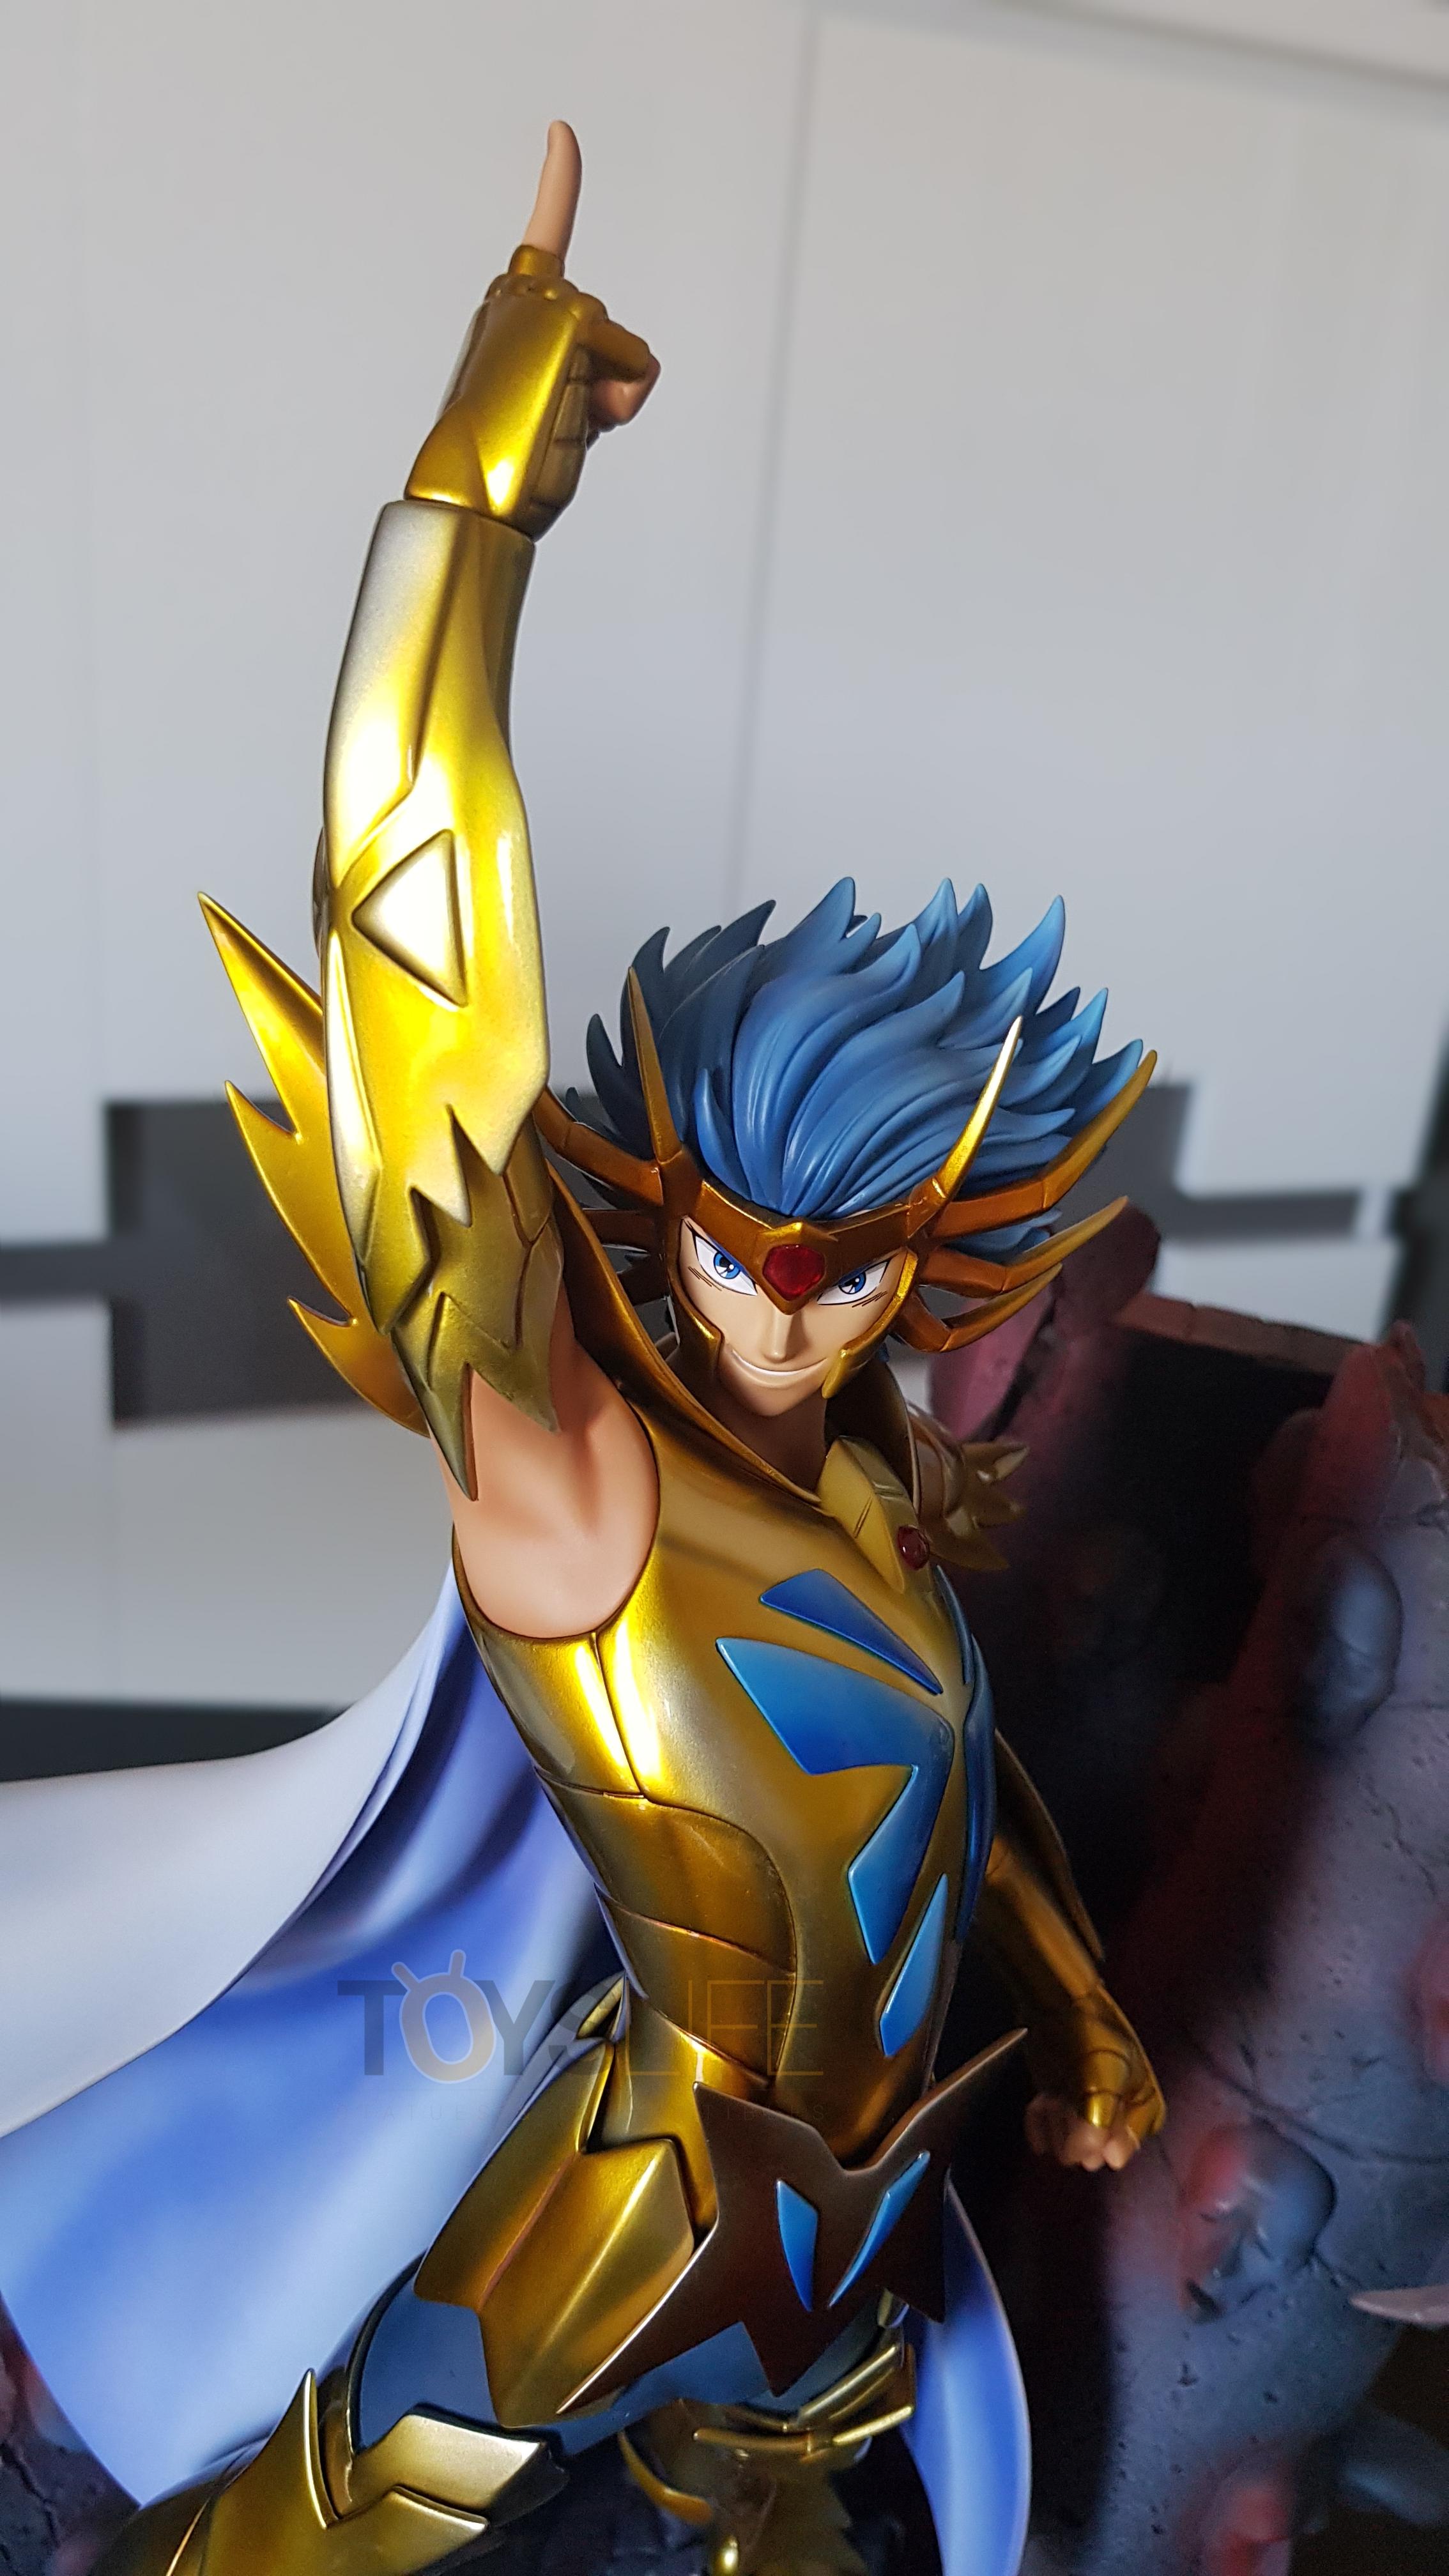 tsume-art-saint-seiya-gold-saint-death-mask-statue-toyslife-review-16